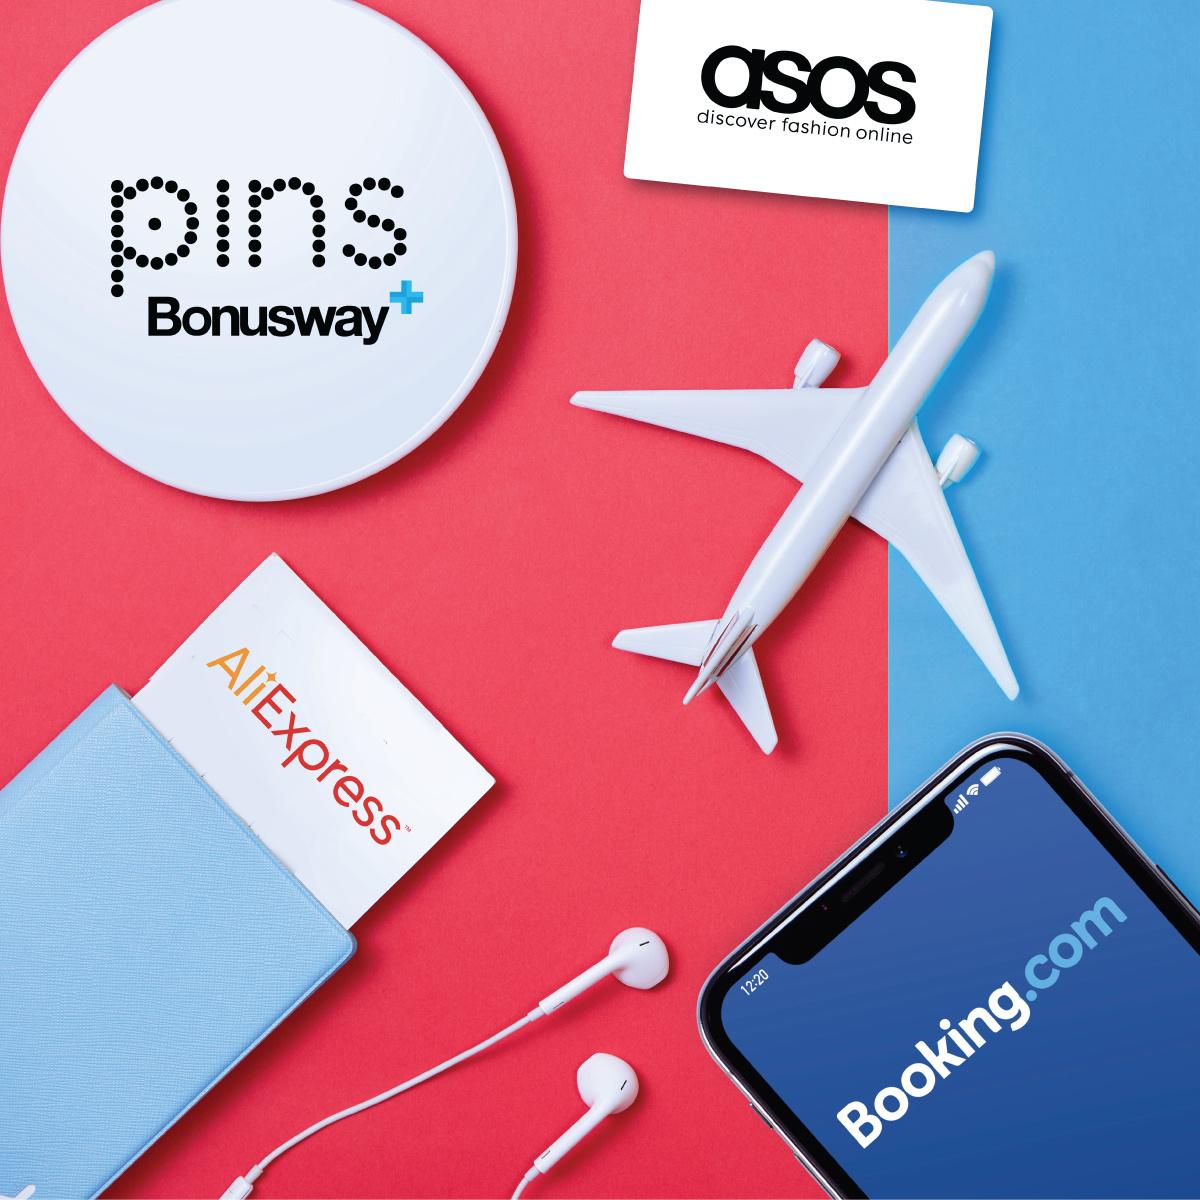 Резервируйте гостиницу или совершайте покупки онлайн через PINS Bonusway и получайте PINS image